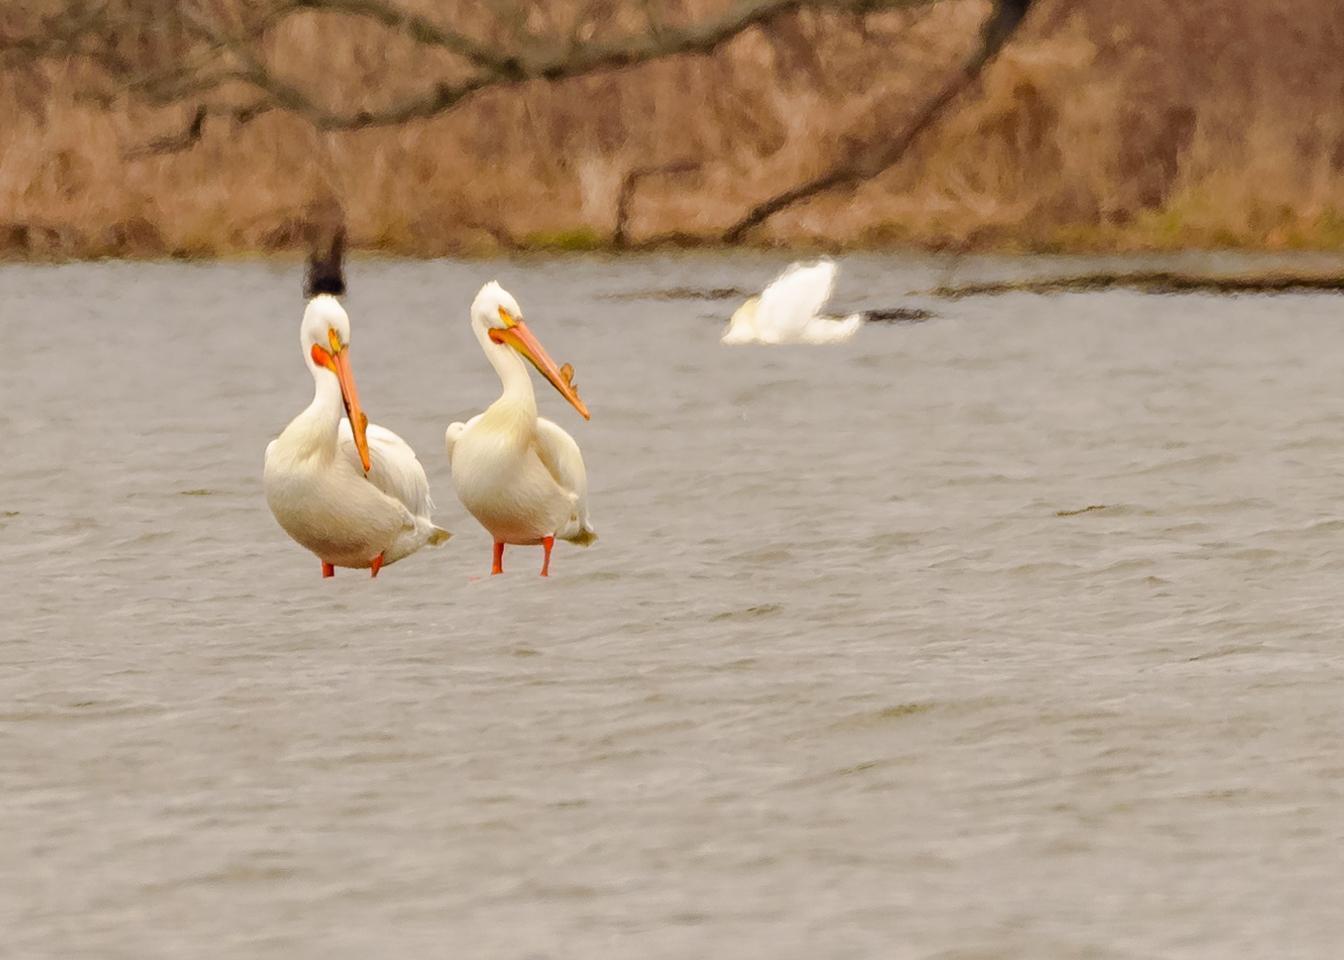 American White Pelican Photo by Keshava Mysore